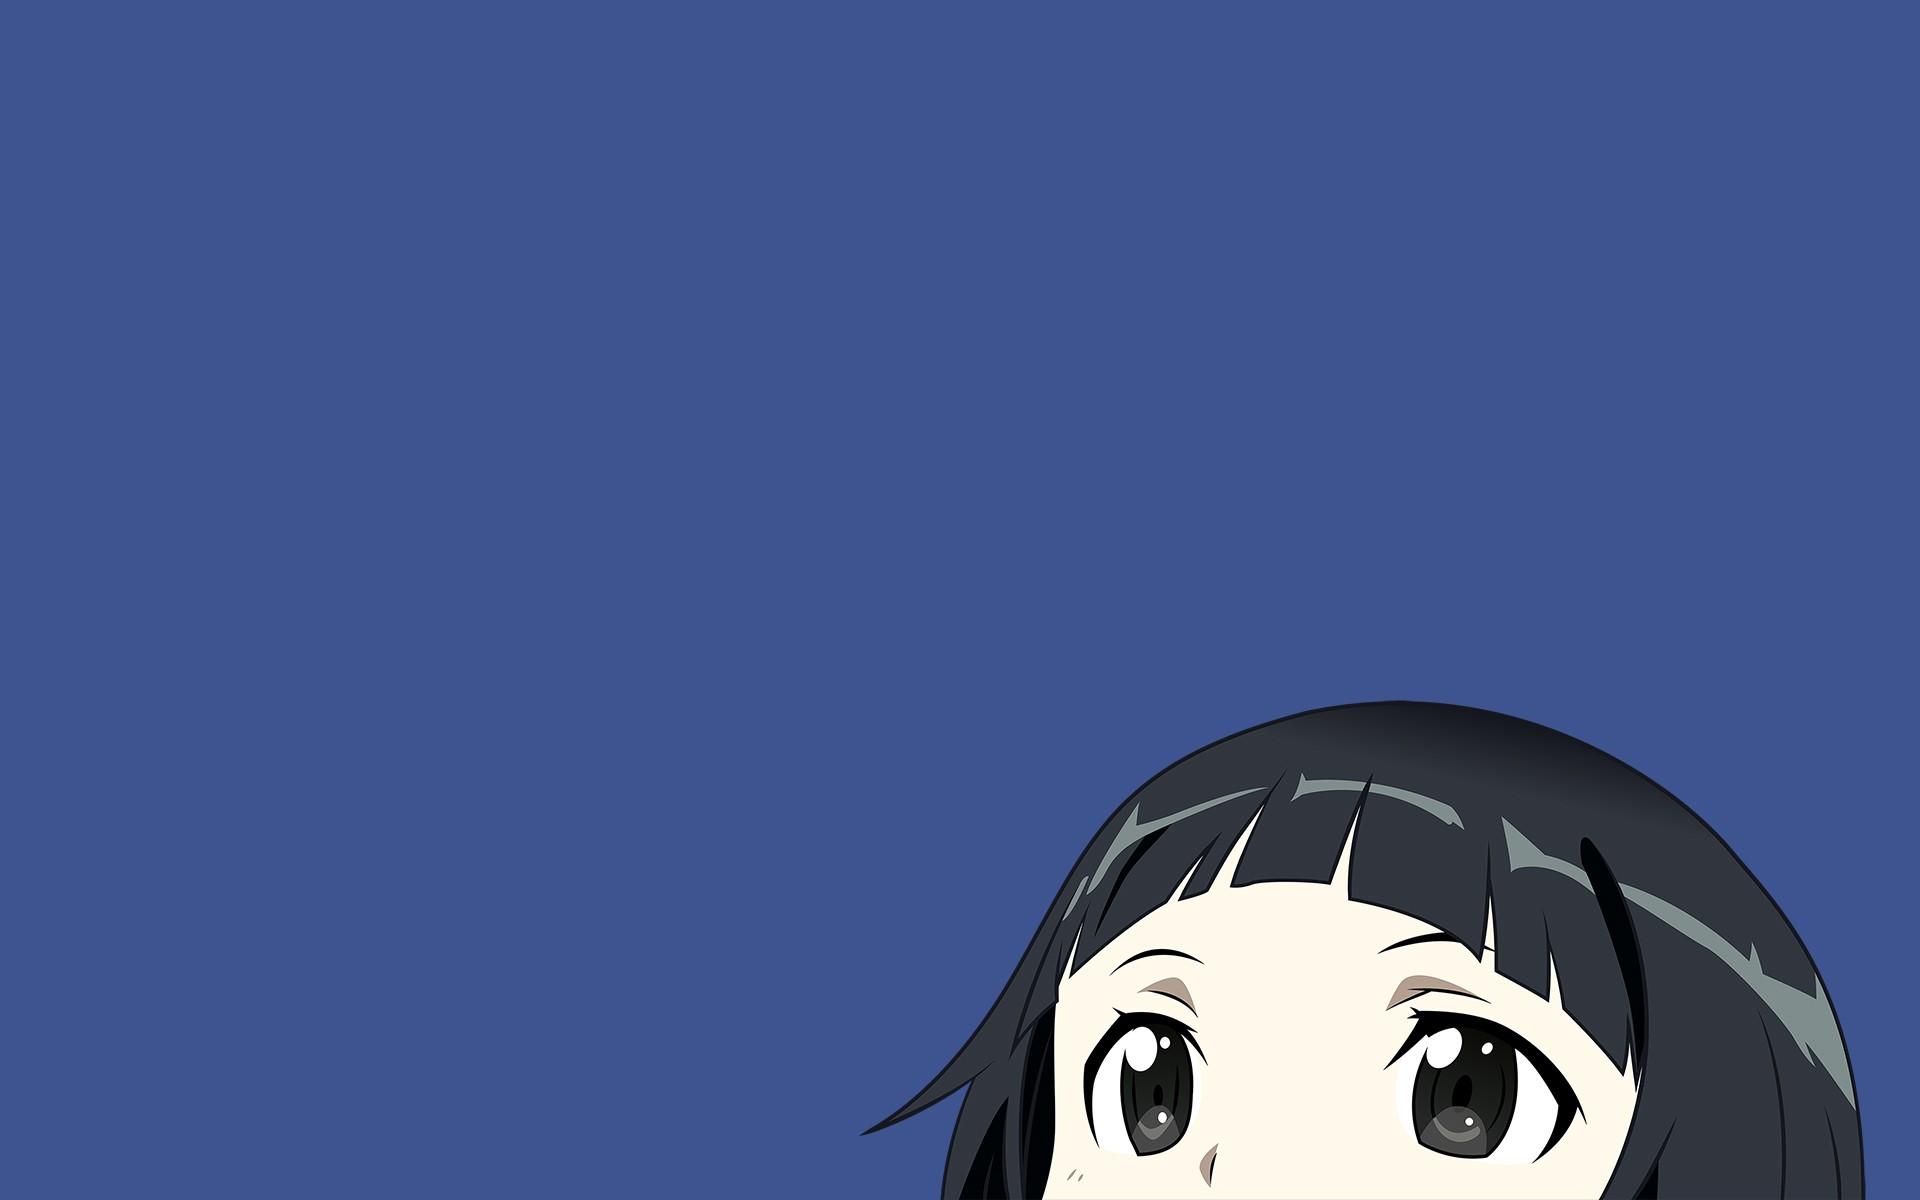 Sword art online hd wallpaper background image - Anime wallpaper black background ...